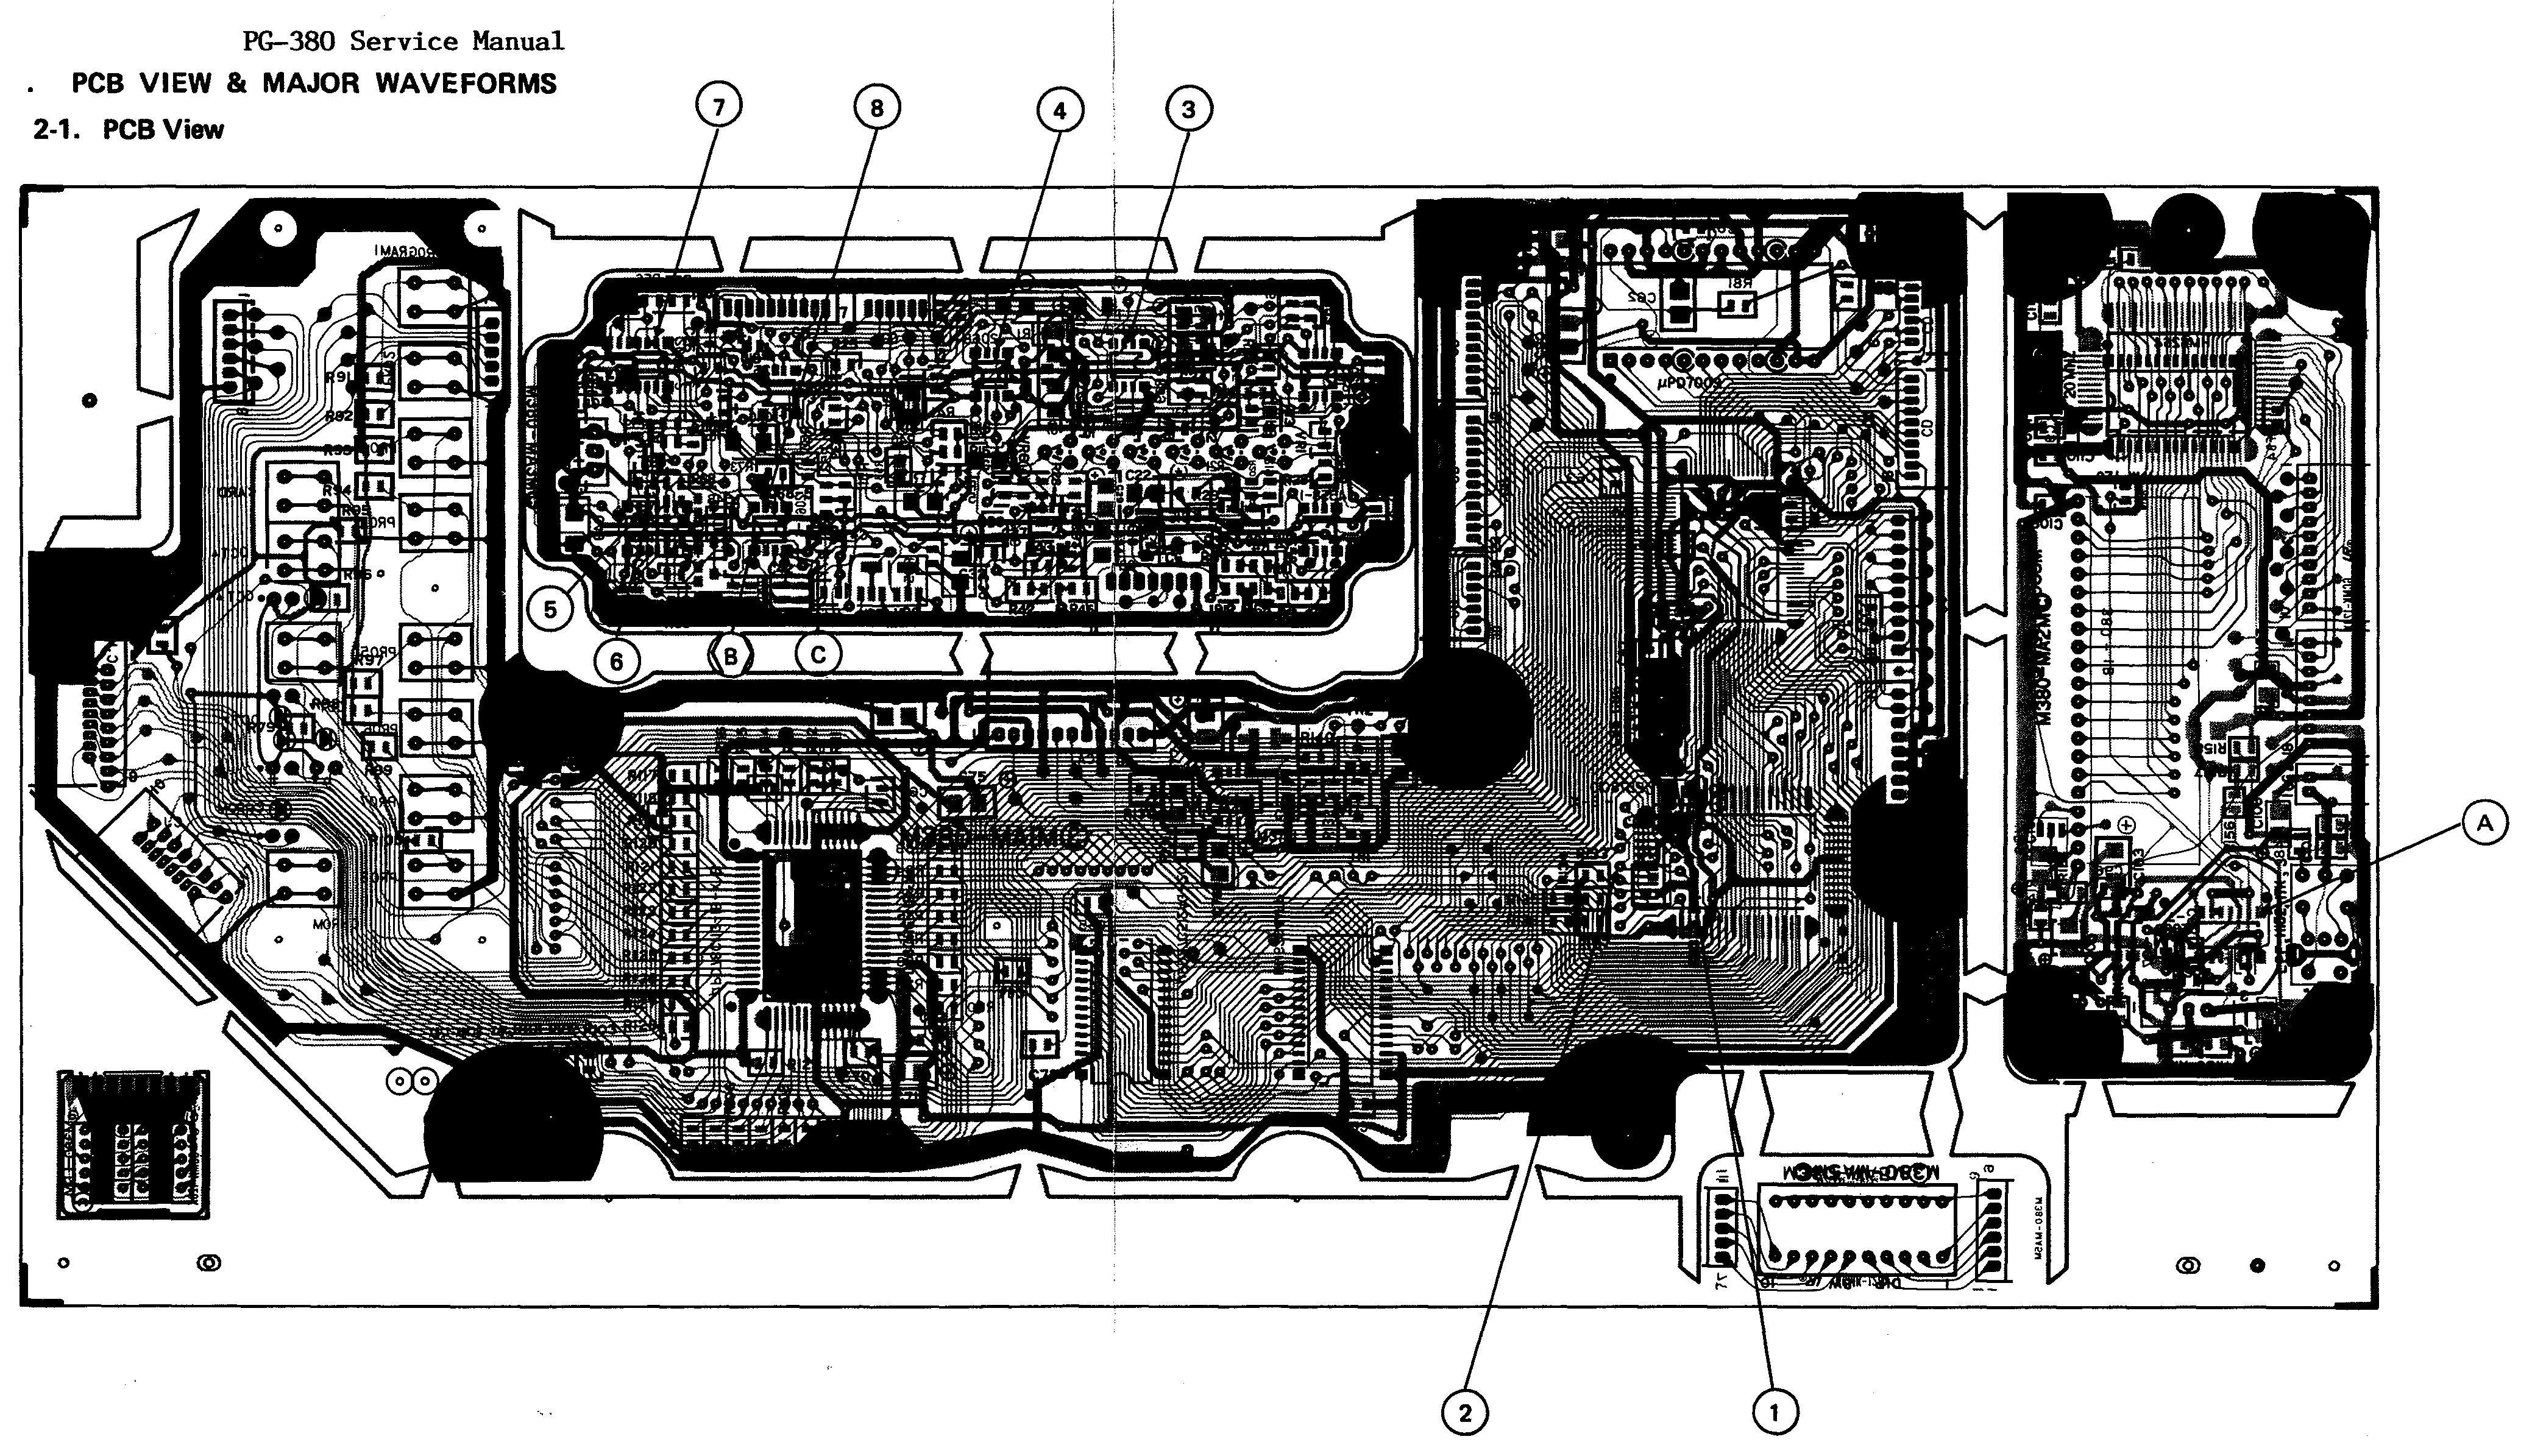 Harman Kardon Schematics Wiring Diagrams 1961 Dodge Seneca Dart Diagram Casio Pg 380 Guitare Synth U00e9tiseur Midi Mark Harding Citation 1 Avr 255